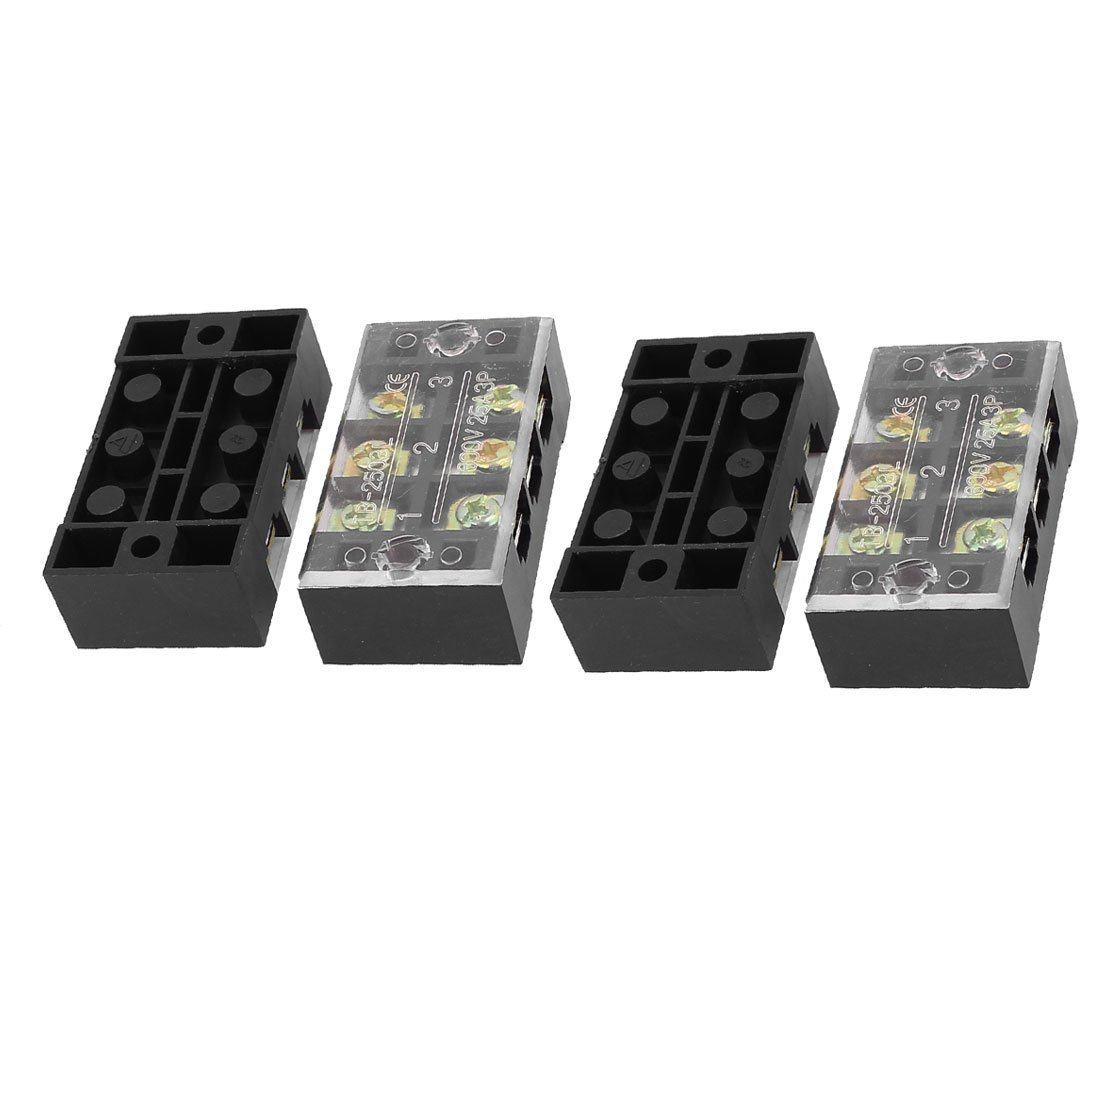 Aexit 4 Pcs 2 Row 3 Position Screw Terminal Block Strip Connector Bar 600V 25A